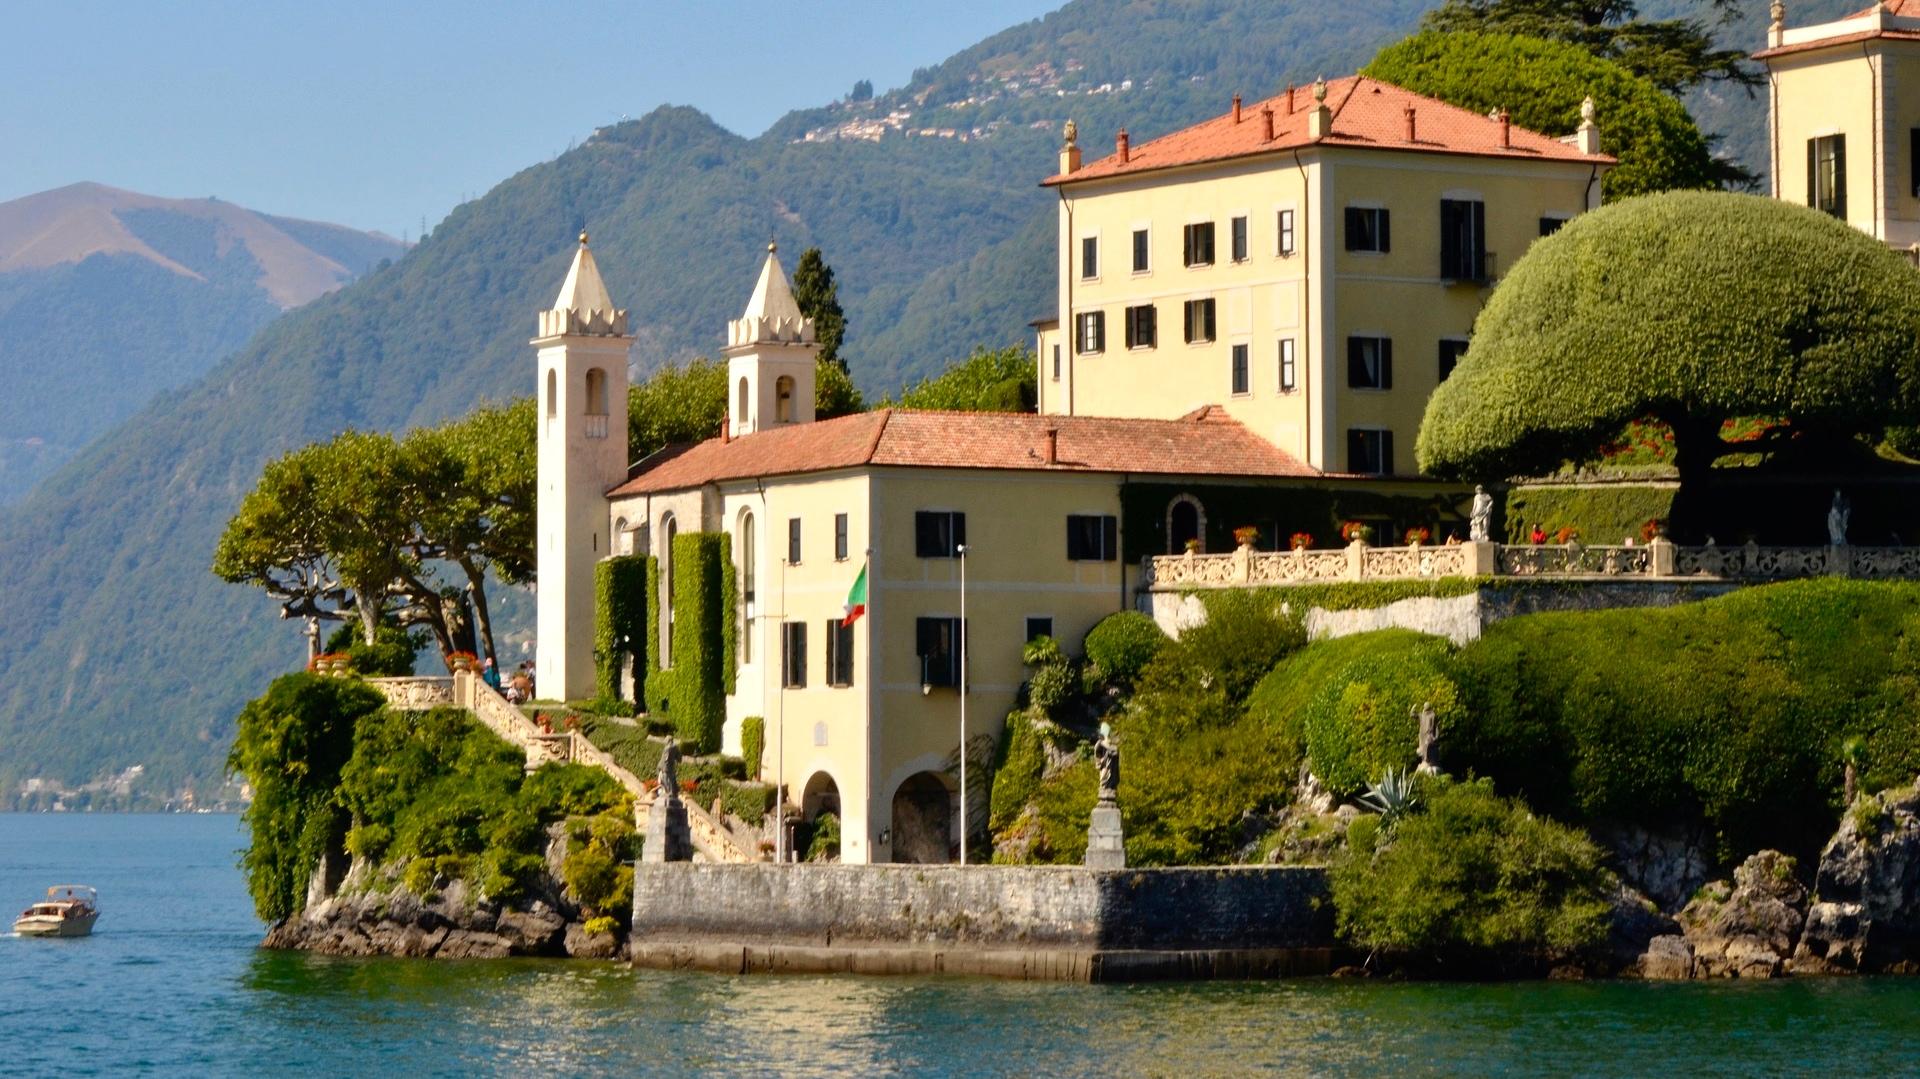 Villa Balbianello, Comomeer, Italië. Star Wars Filmlocatie